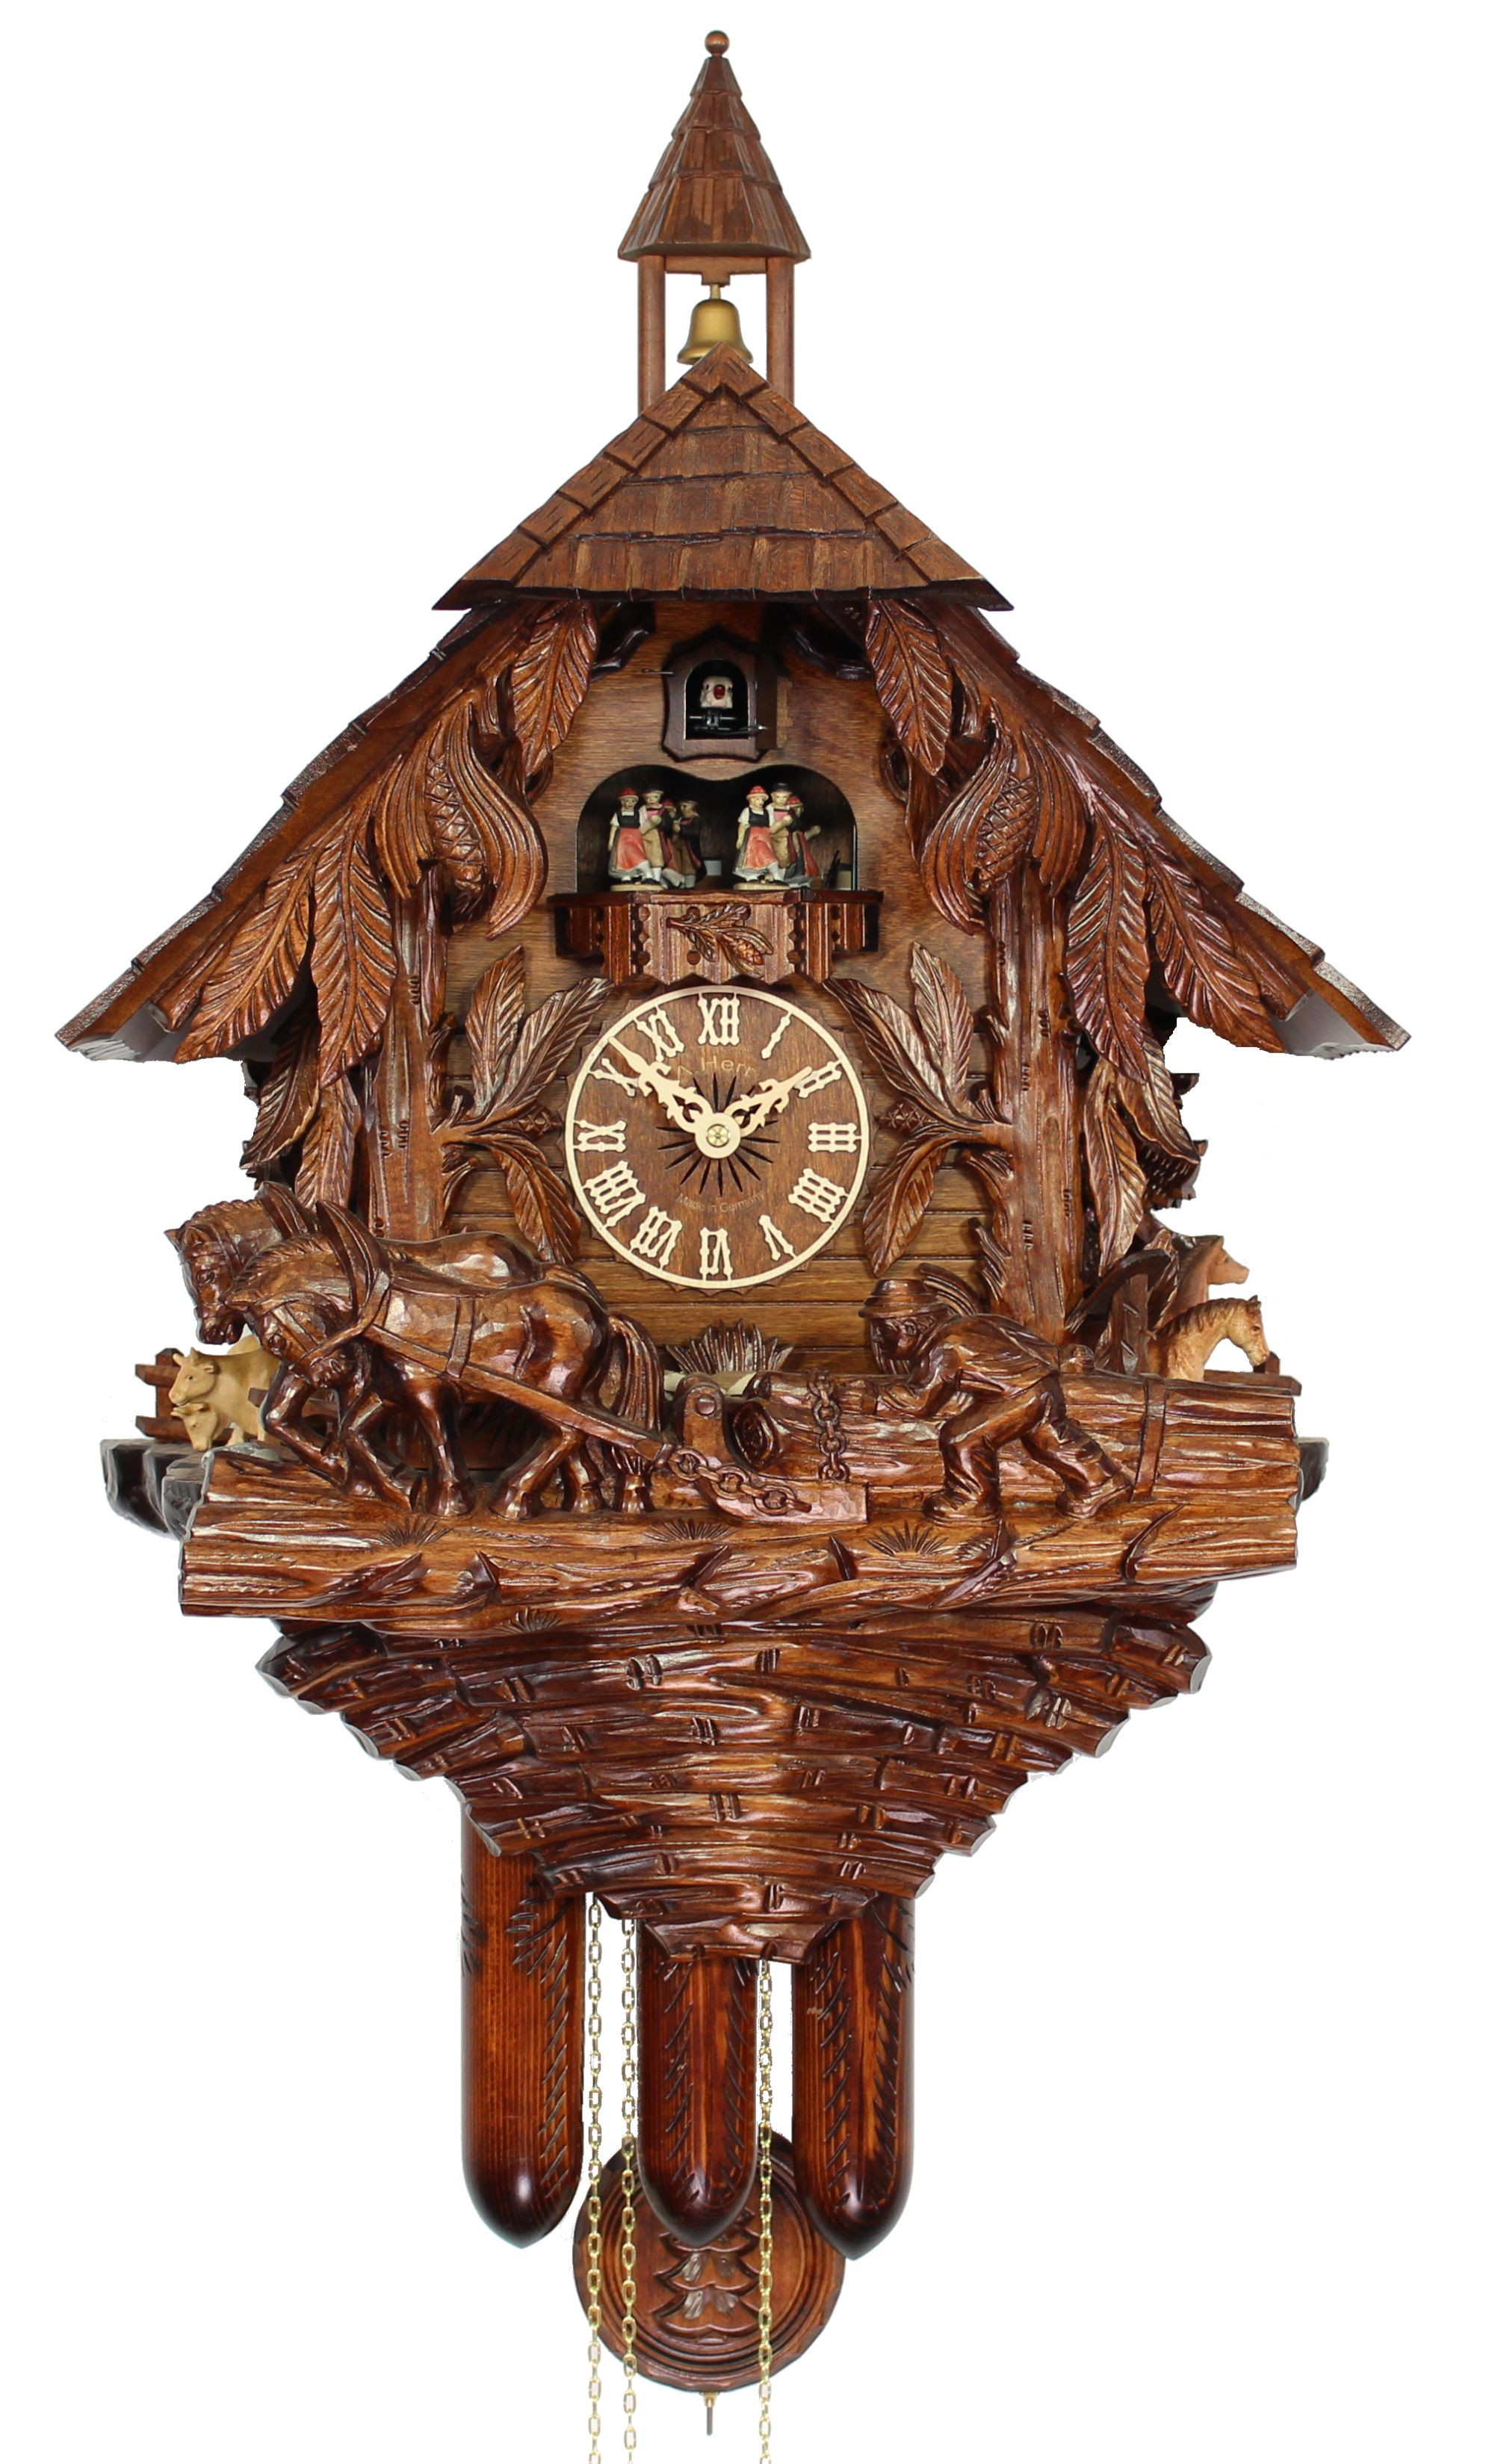 Herrzeit cuckoo clock the lumberjack ah uk 40 8tmt new ebay - Coo coo clock pendulum ...